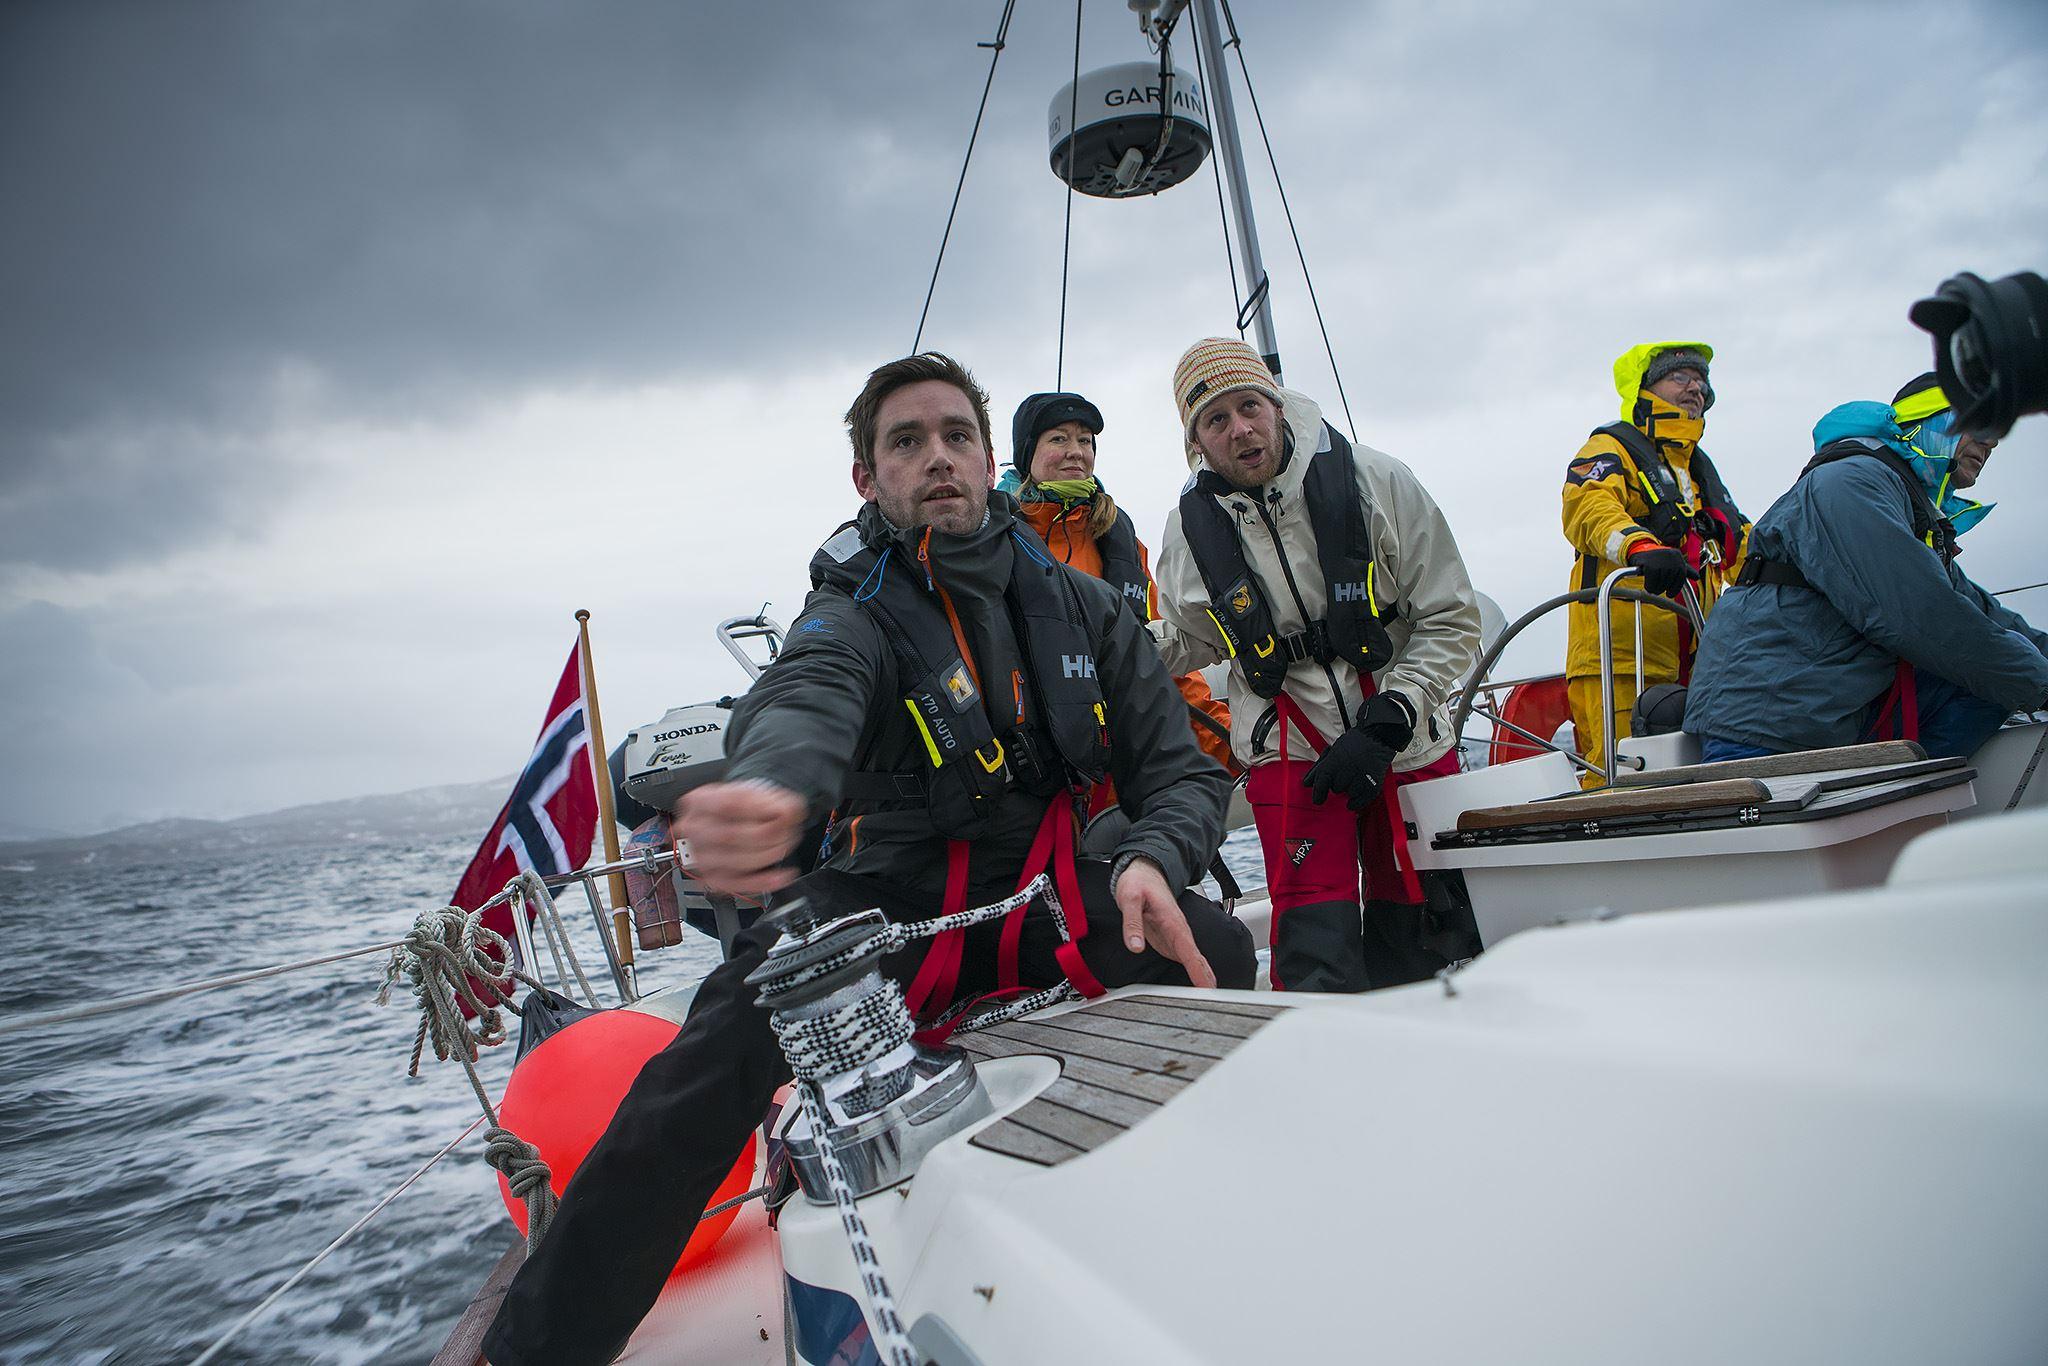 © Mats Grimsæth/SeilNorge, Adventure photography with Mats Grimsæth